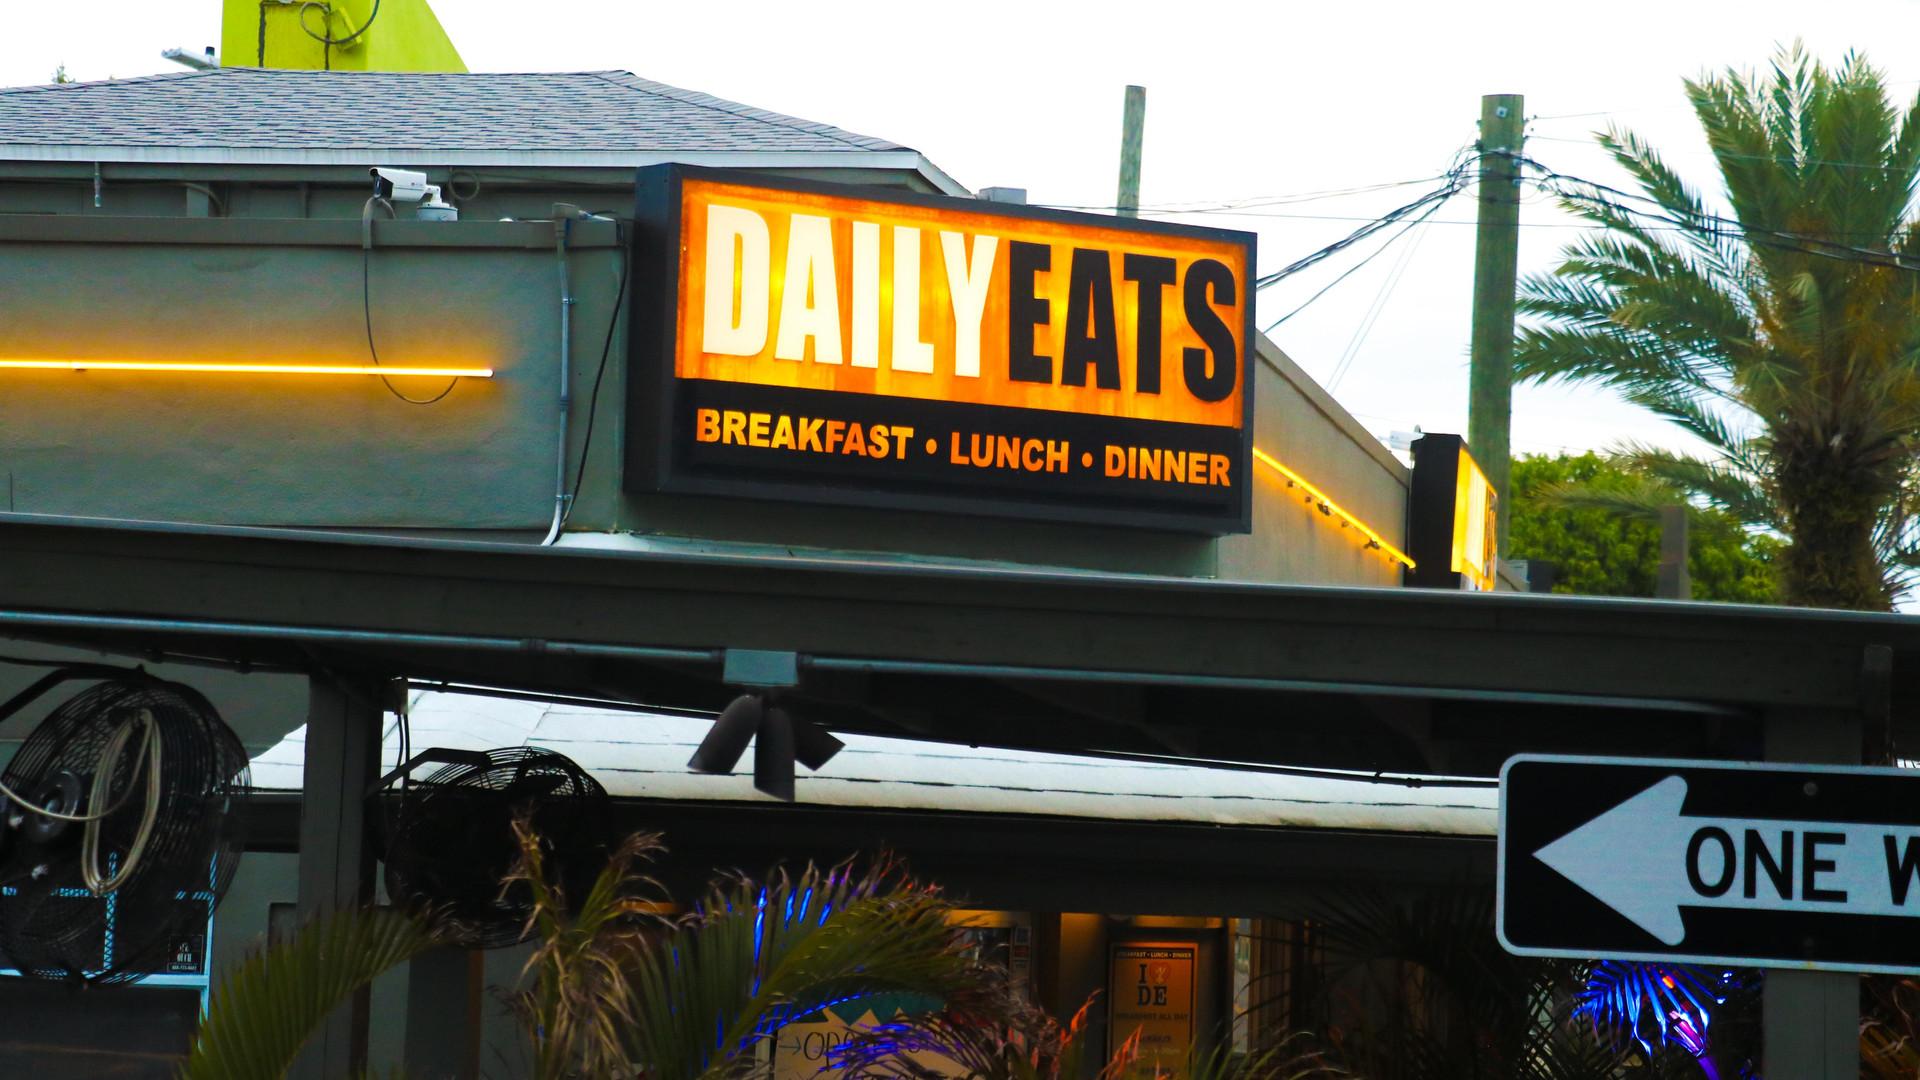 daily eats.jpg